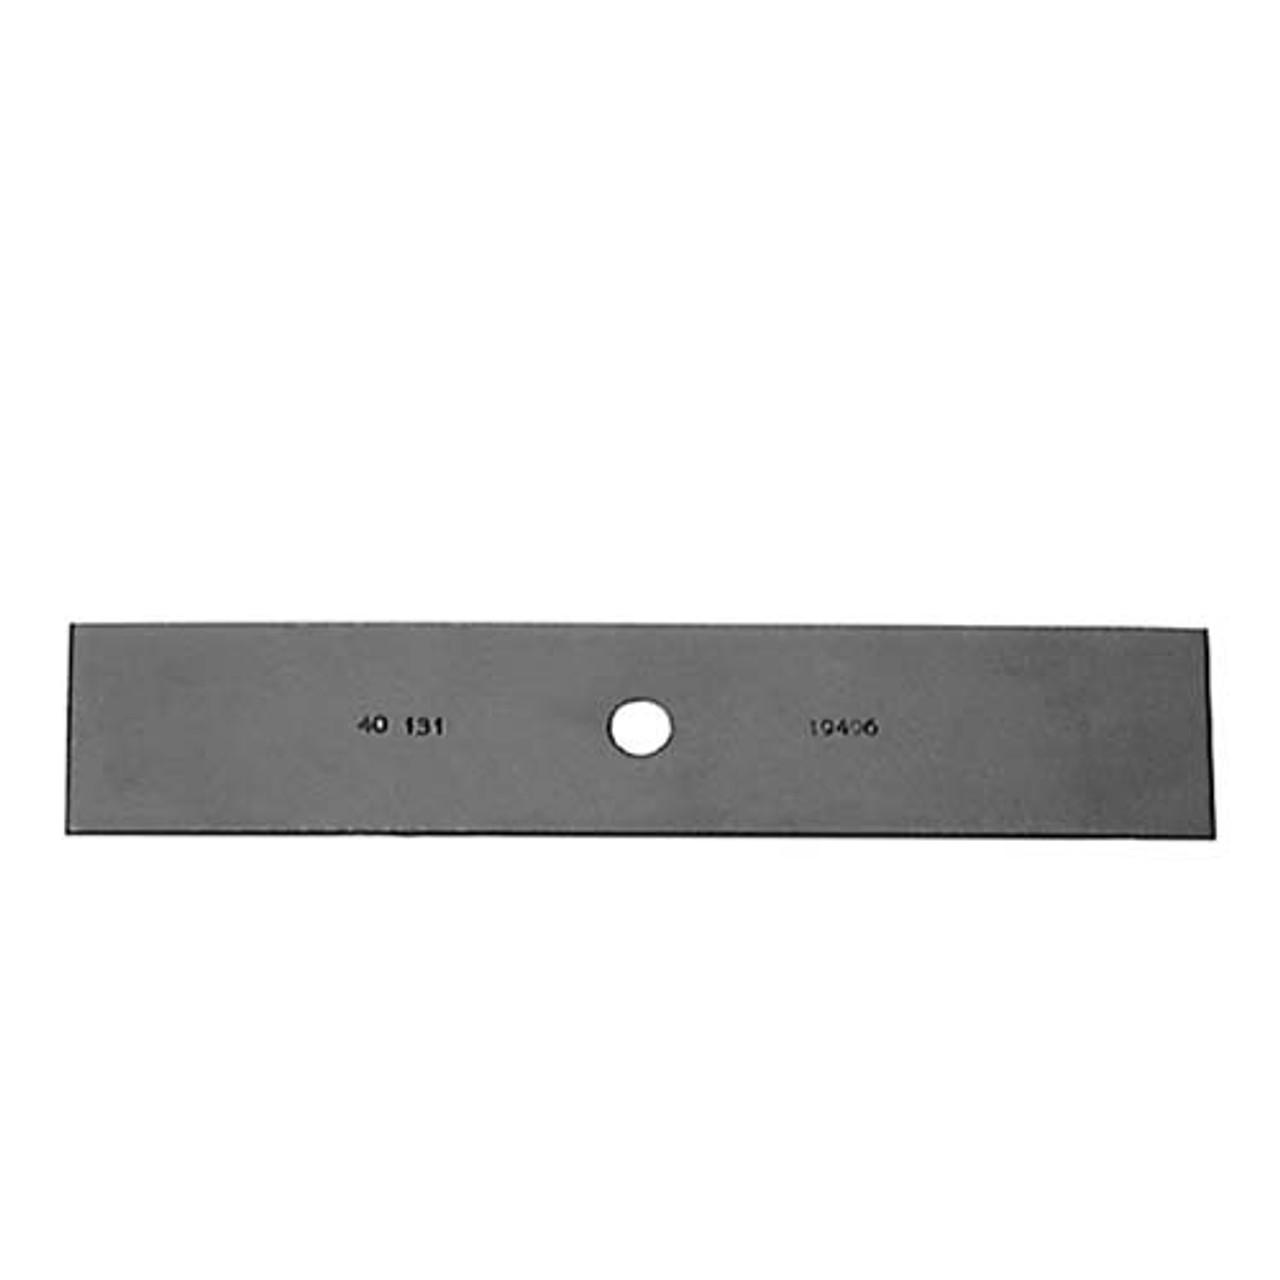 OREGON 40-131 - EDGER BLADE 10IN POWER TRIM - Product Number 40-131 OREGON